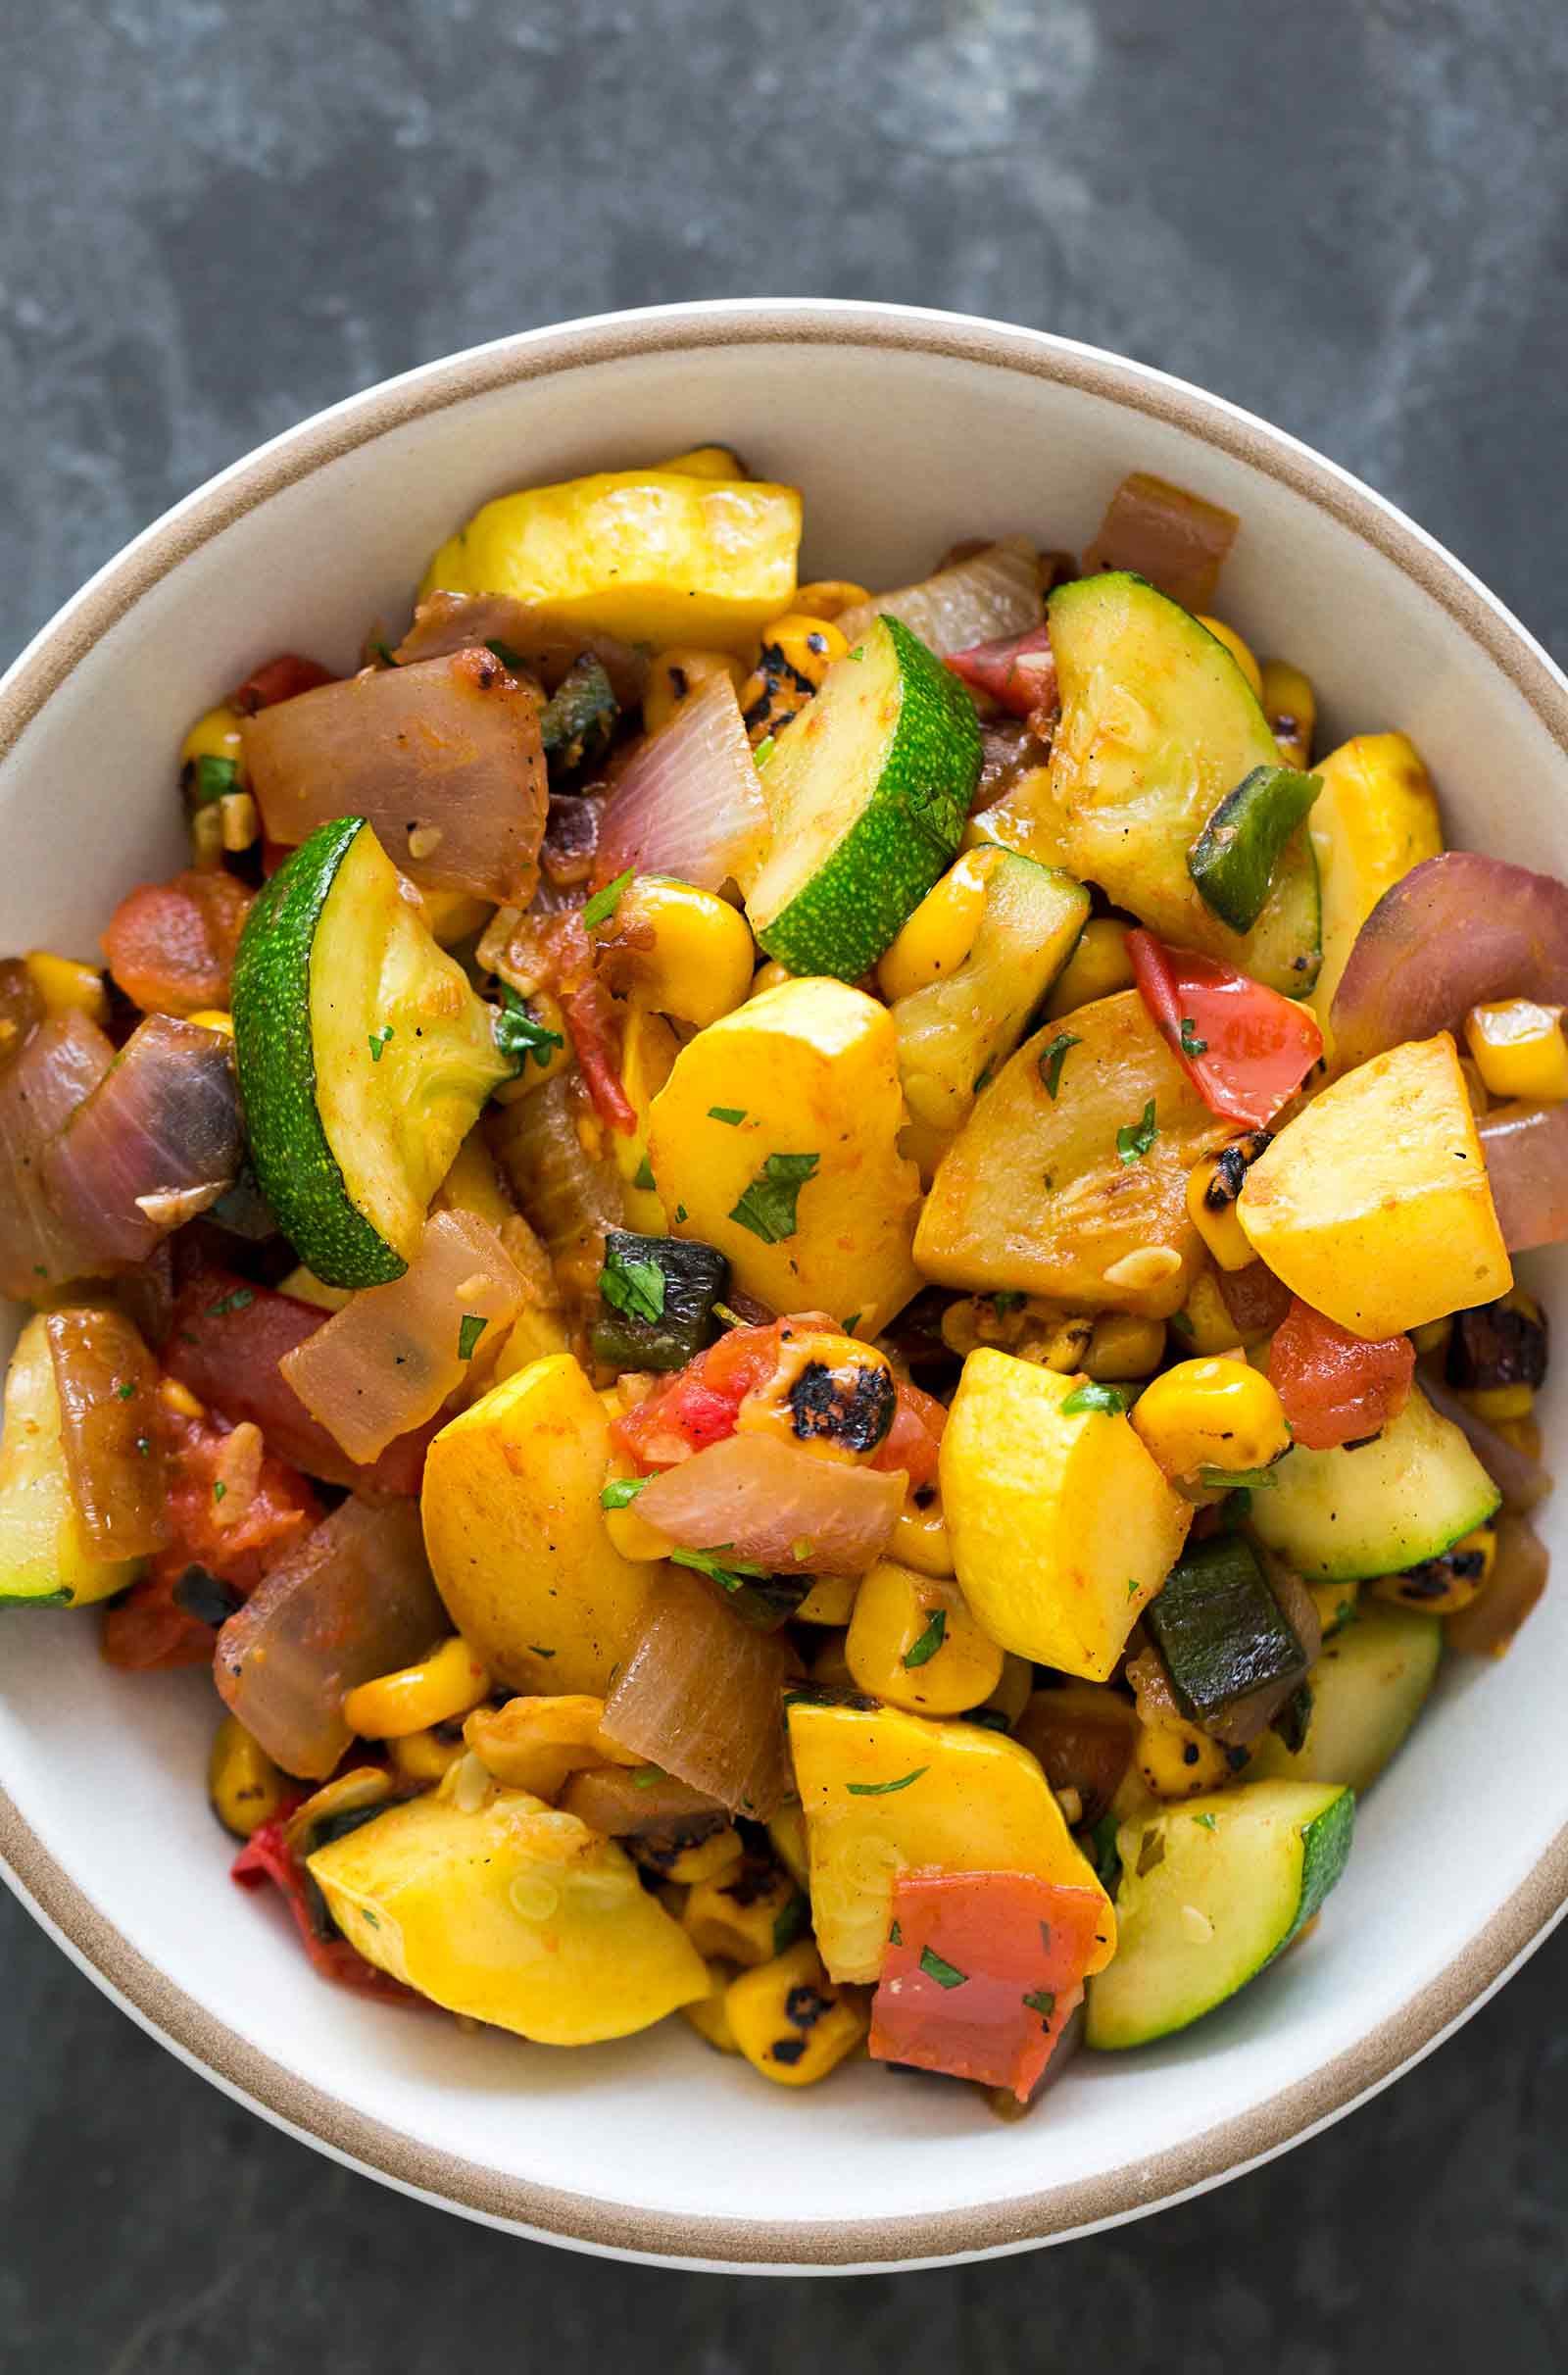 Vegetarian Recipes For Summer  Summer Squash Green Chile Stir Fry Recipe